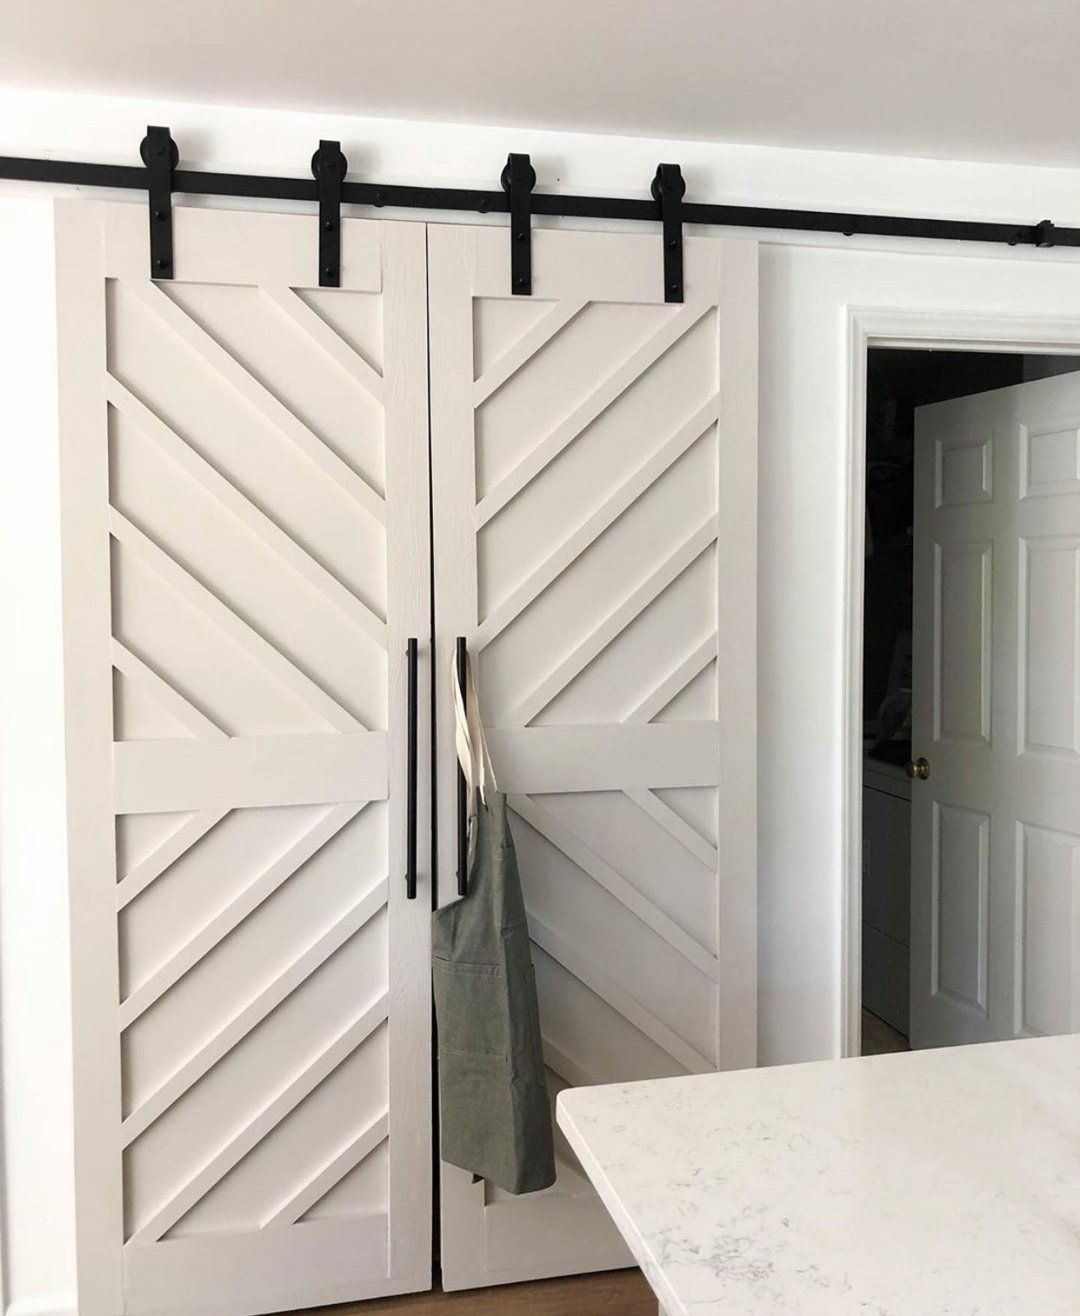 Raised Chevron Panel Interior Sliding Barn Door Rustic Luxe Designs In 2020 Interior Sliding Barn Doors Diy Sliding Barn Door Interior Barn Doors